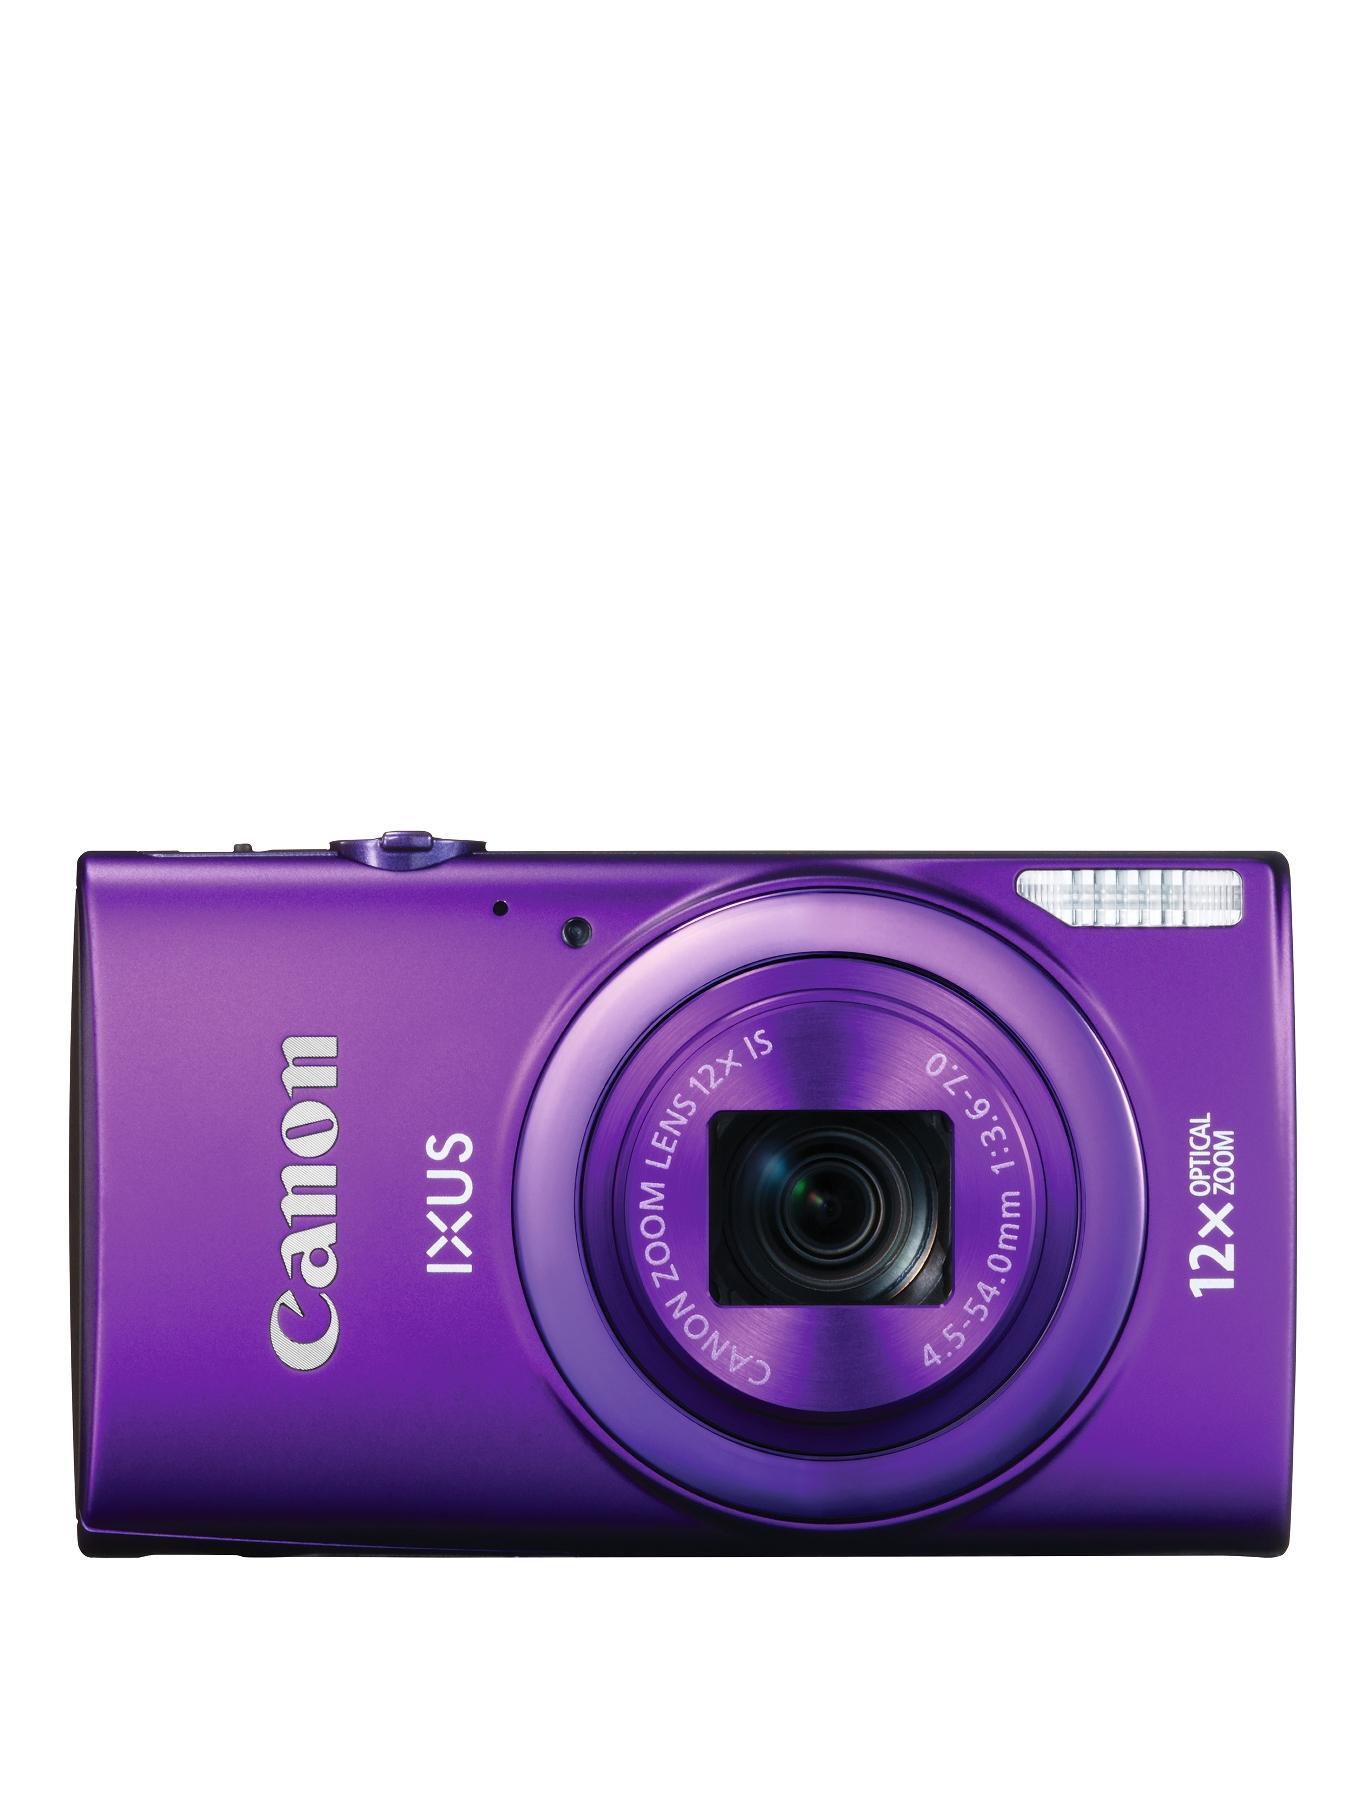 Canon IXUS 265 HS Compact Digital Camera